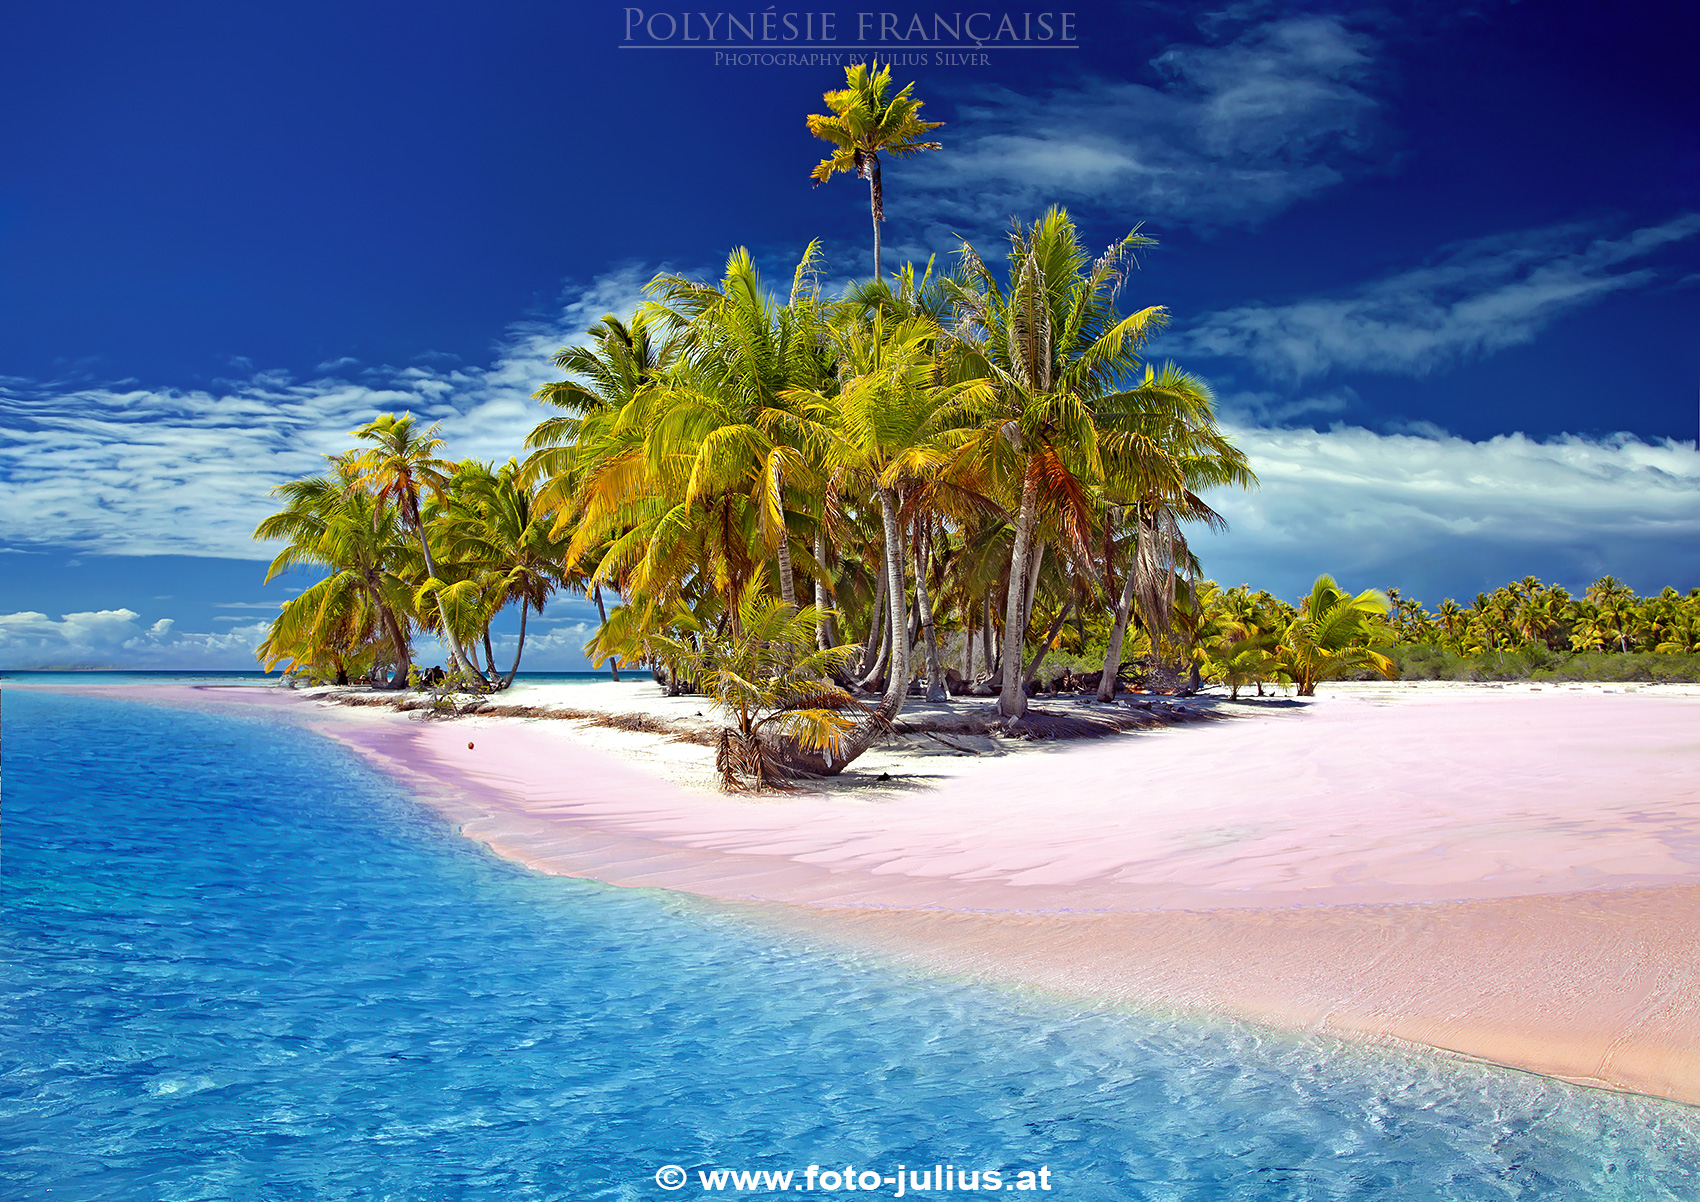 061a traumziele urlaub polynesien for Rangiroa urlaub